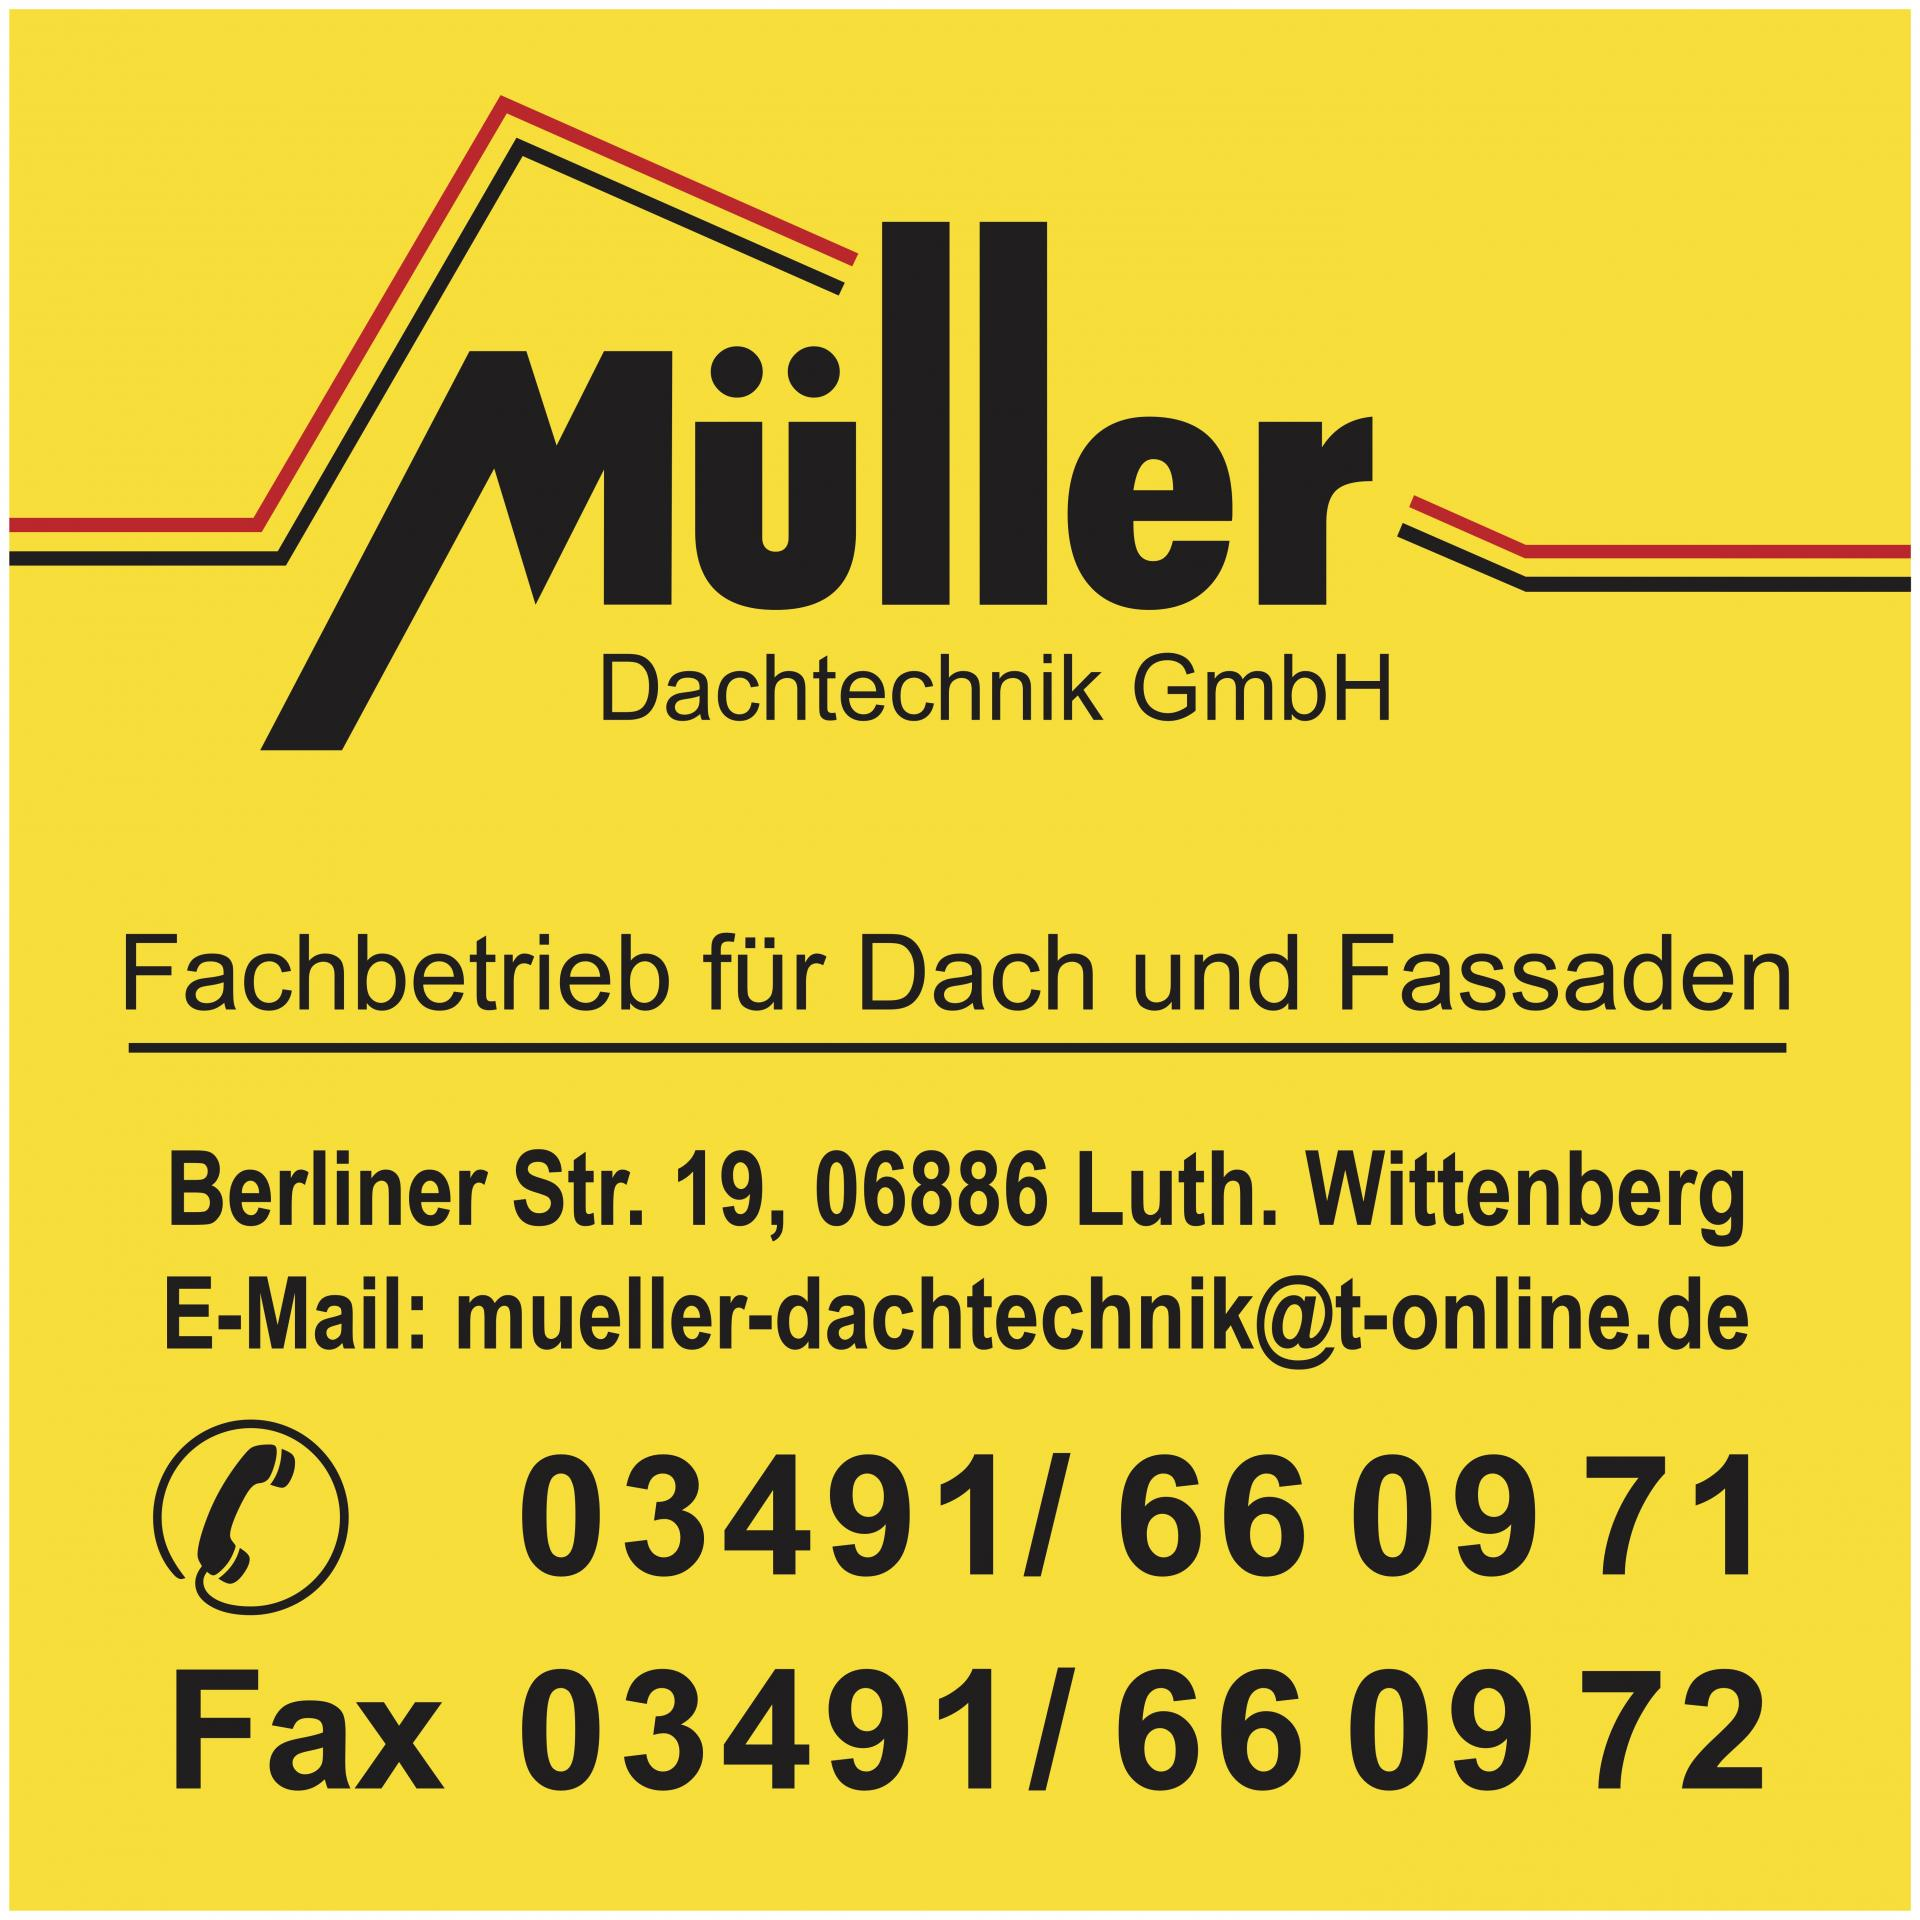 Müller Dachtechnik